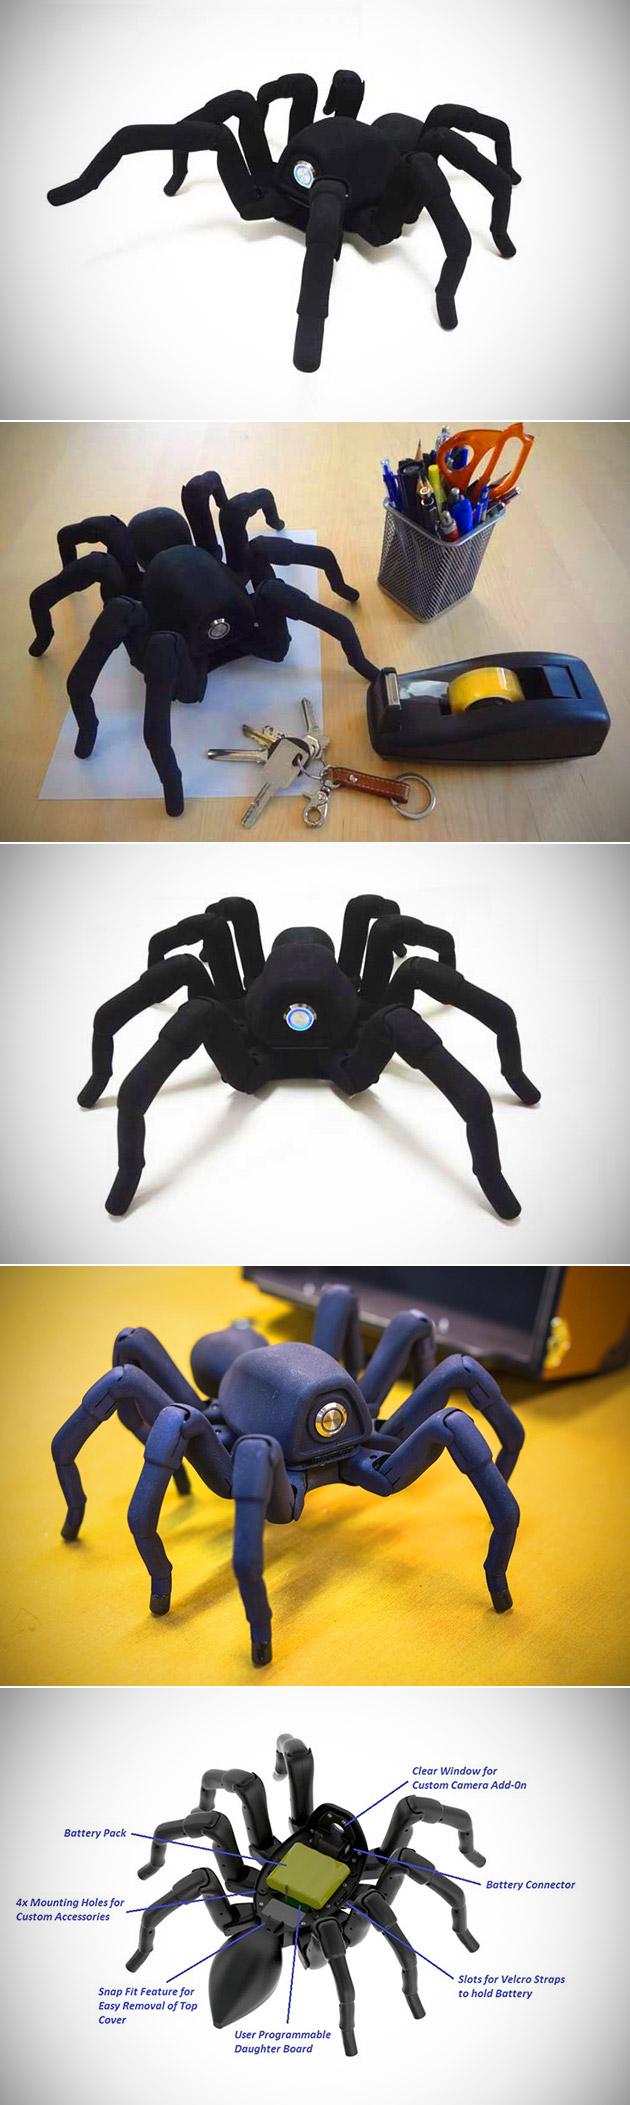 T8 3D-Printed Robot